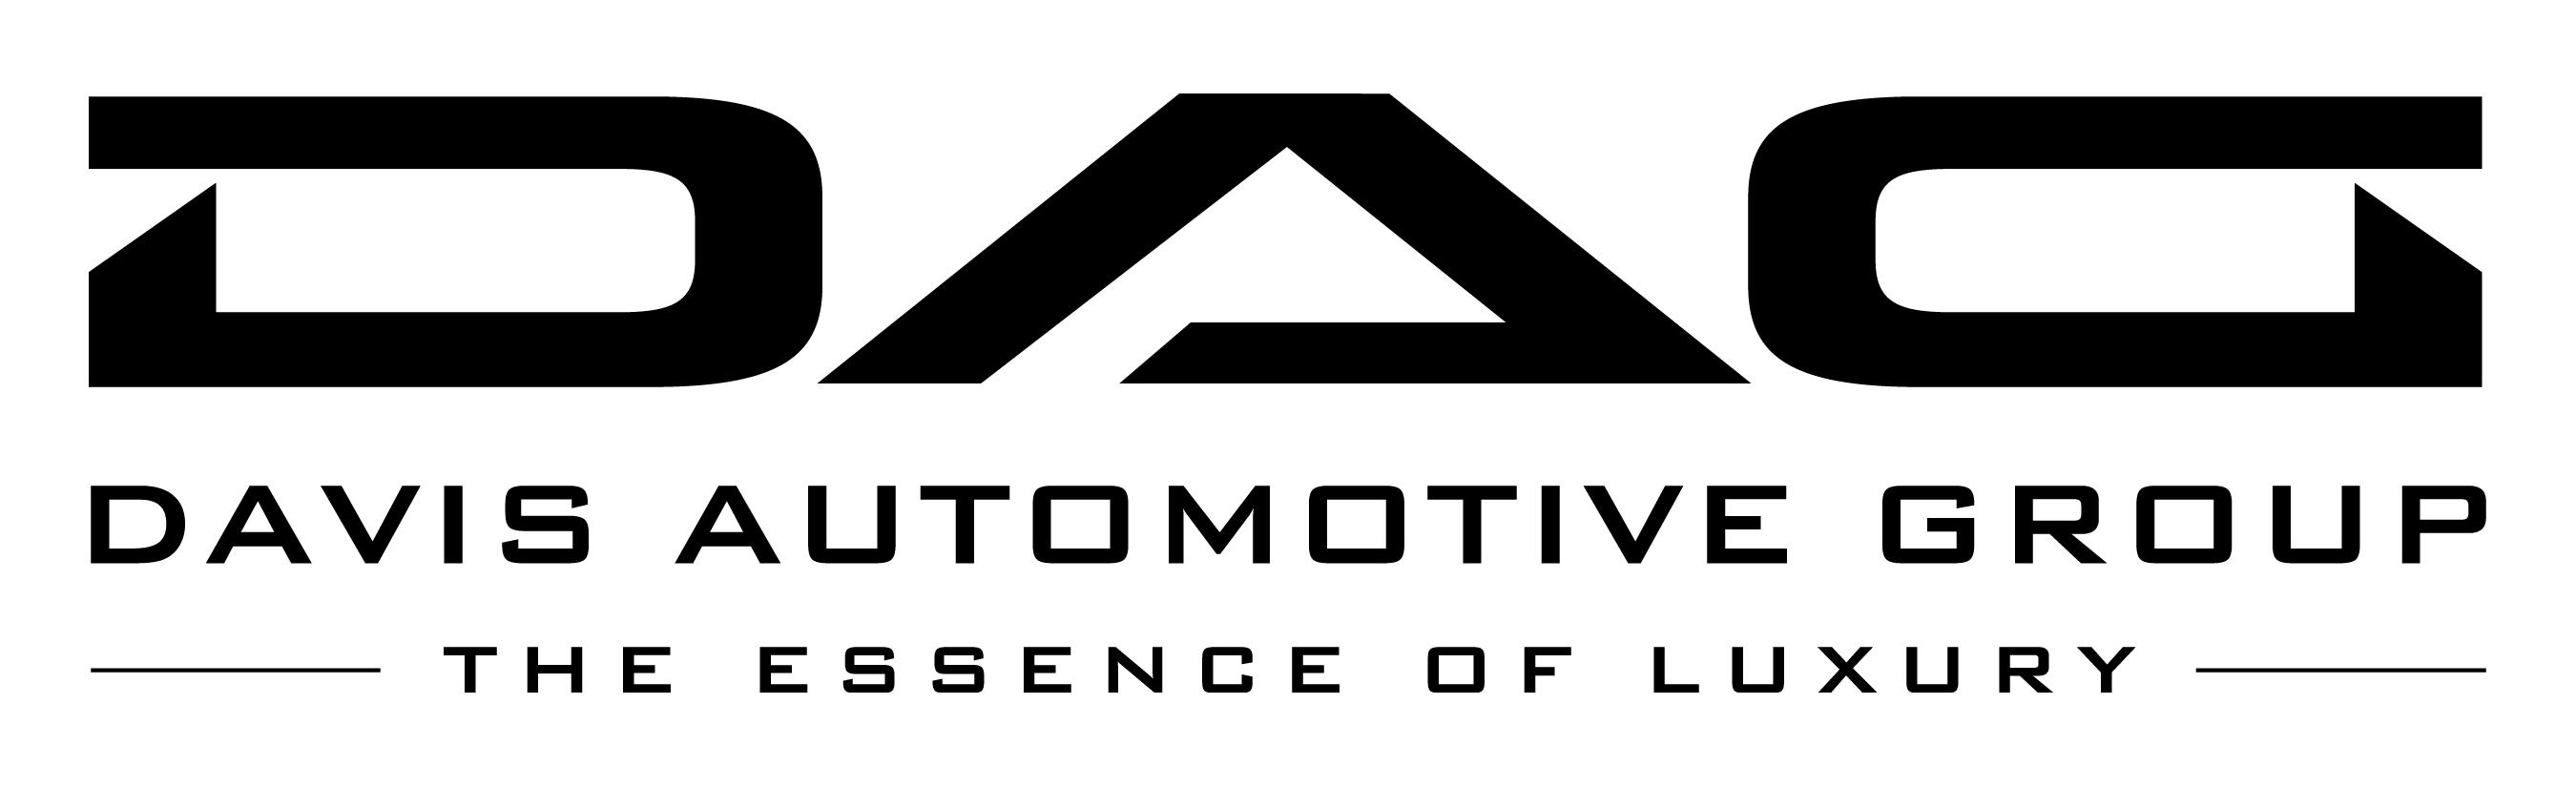 Logo DAG_davis_automotive_group_LG